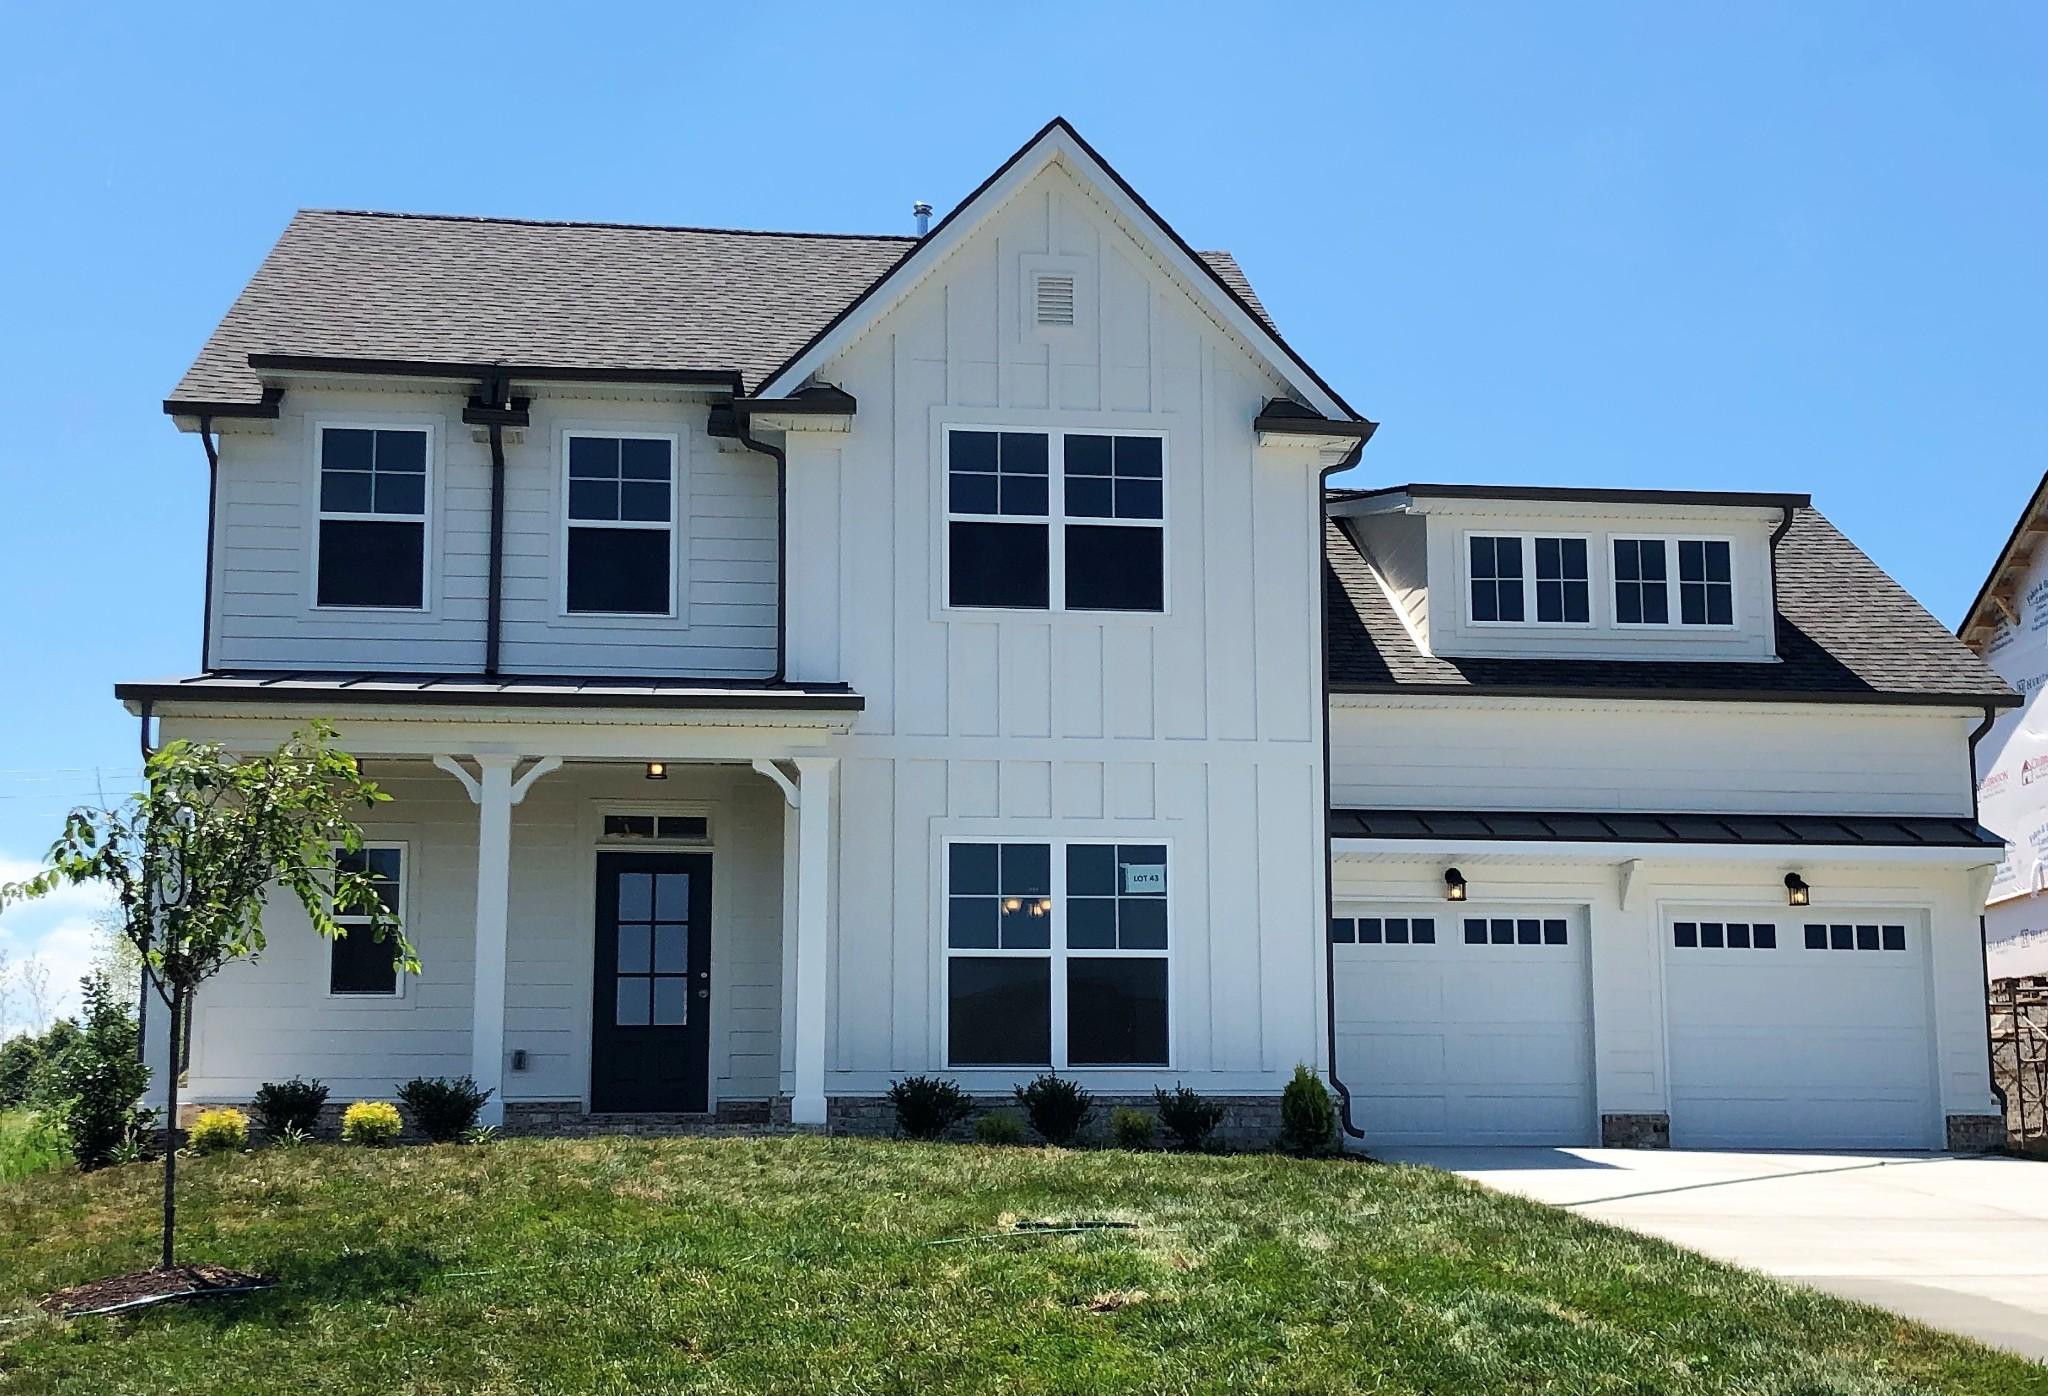 5219 Bridgemore Blvd #101, Murfreesboro, TN 37128 - Murfreesboro, TN real estate listing